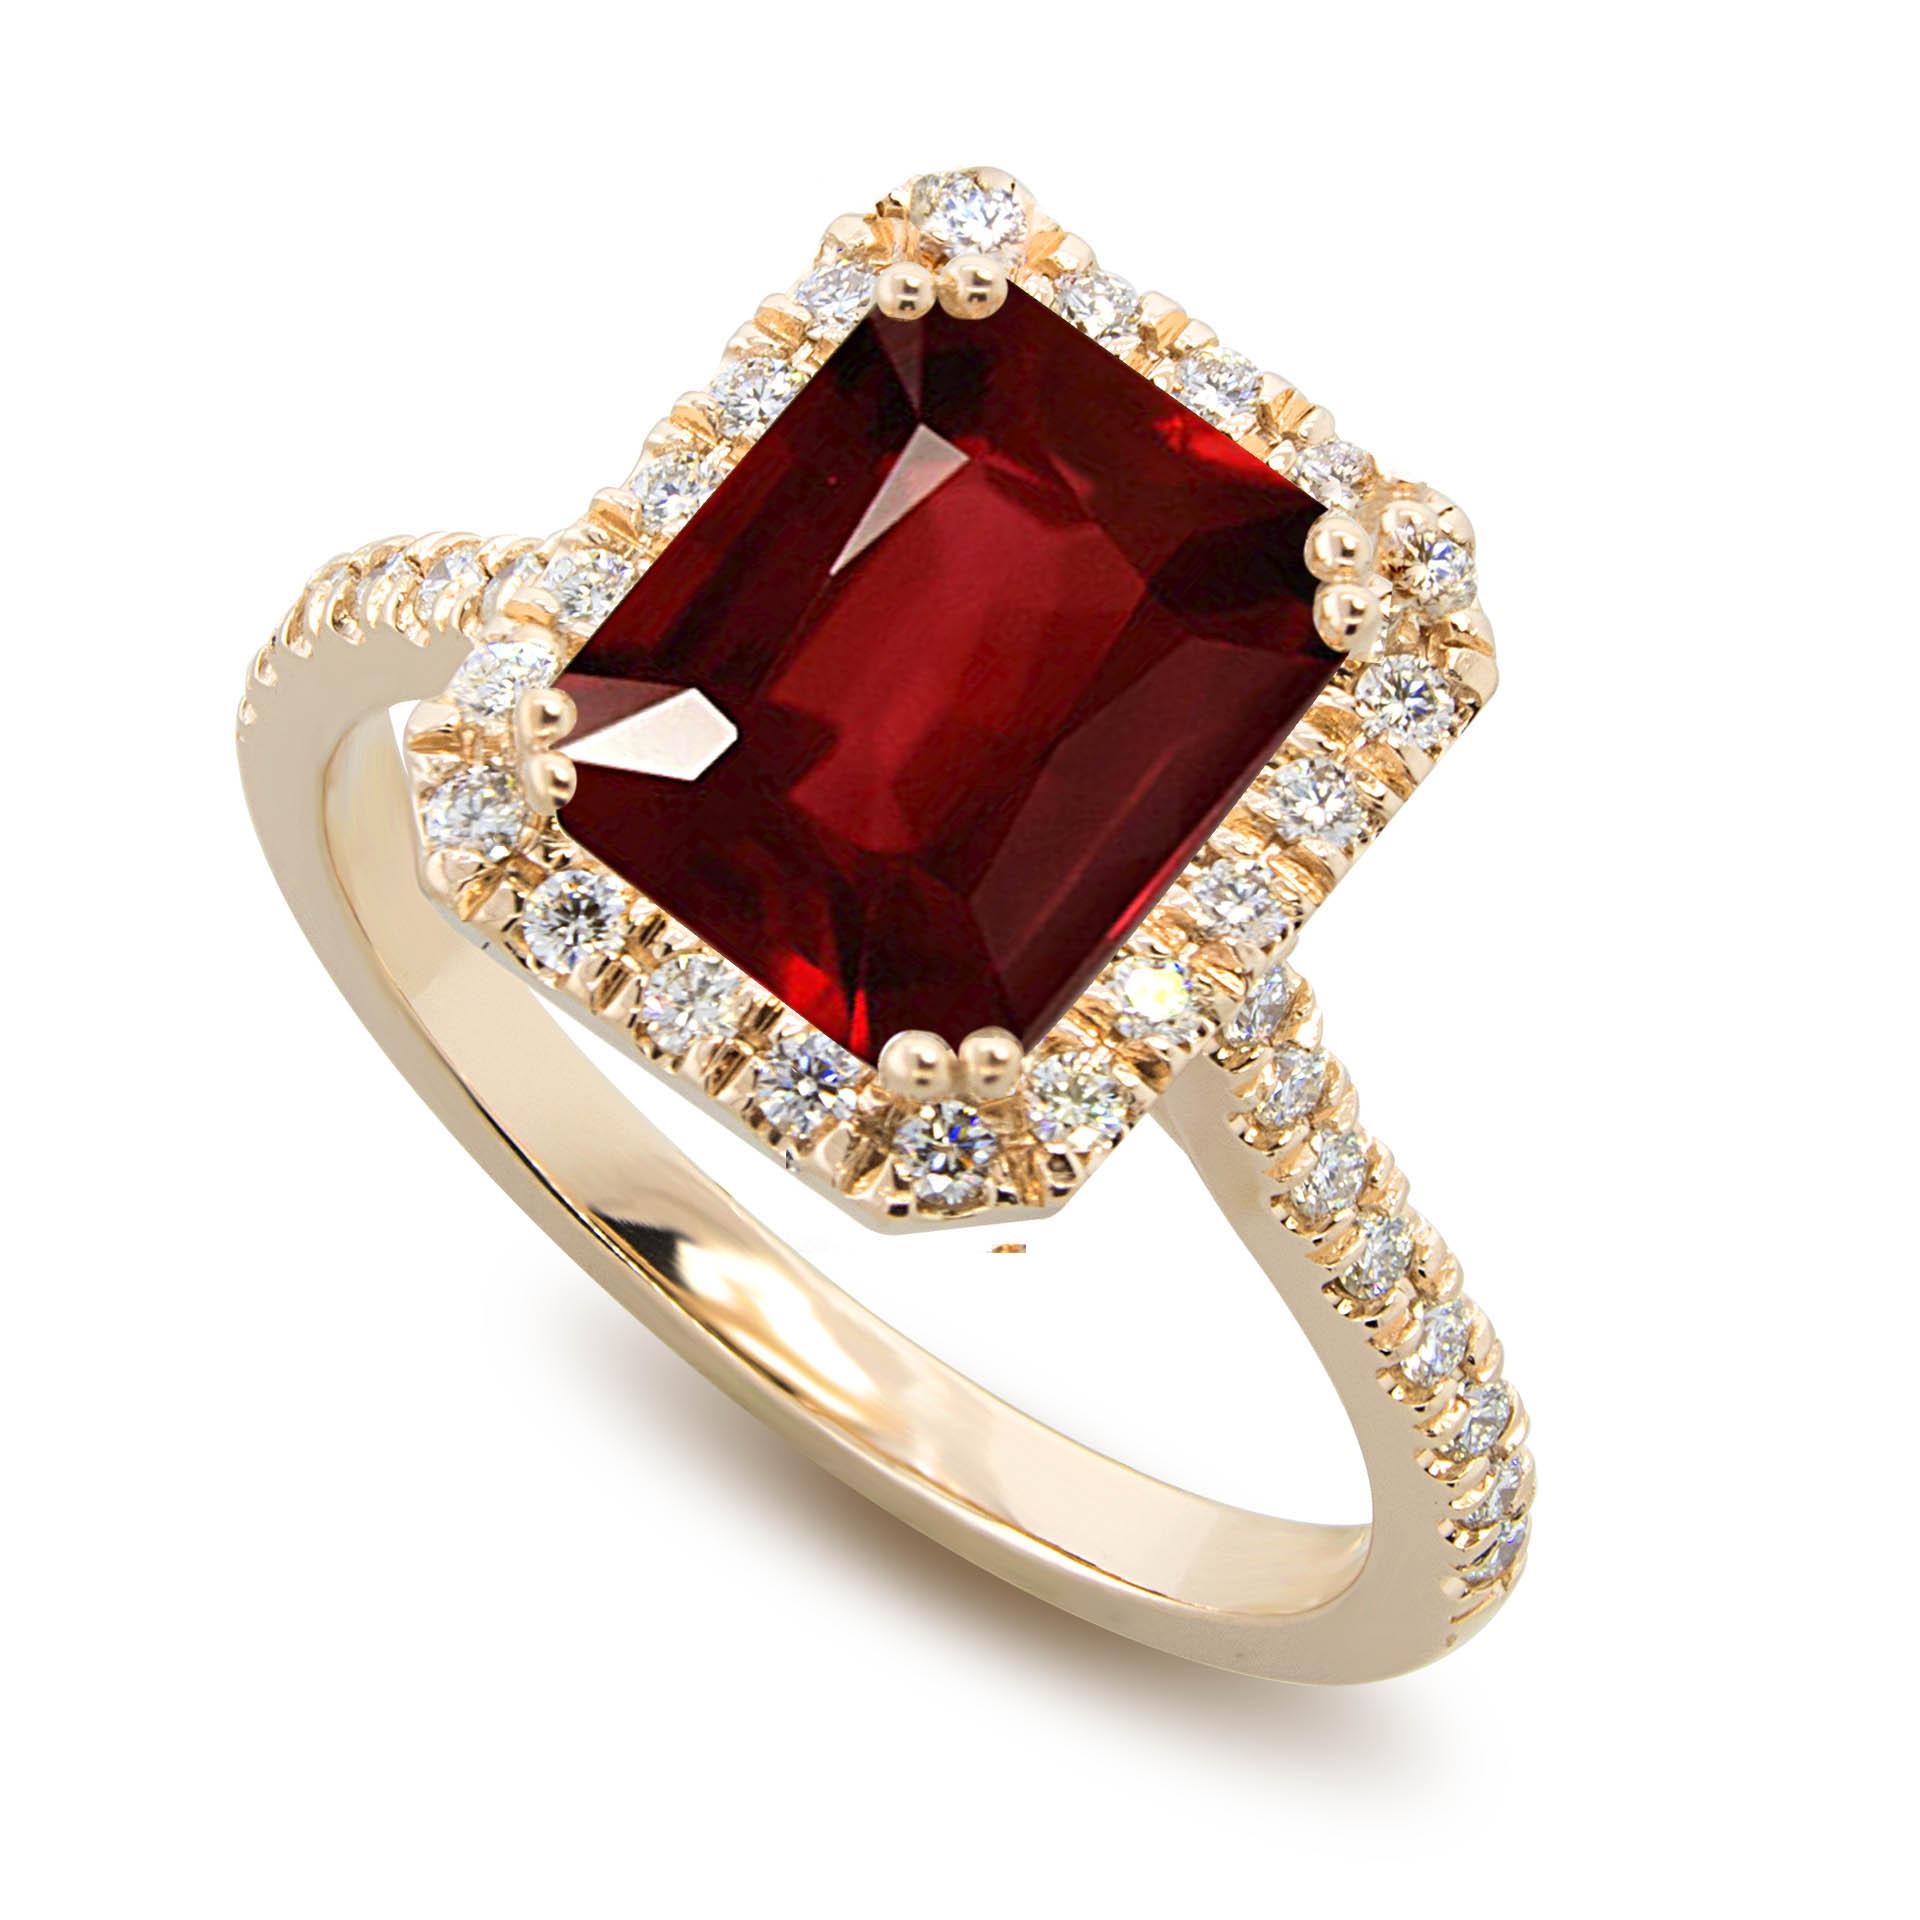 646b38a0c3634 Genuine Burma Ruby Halo Engagement Ring, Gold or Platinum